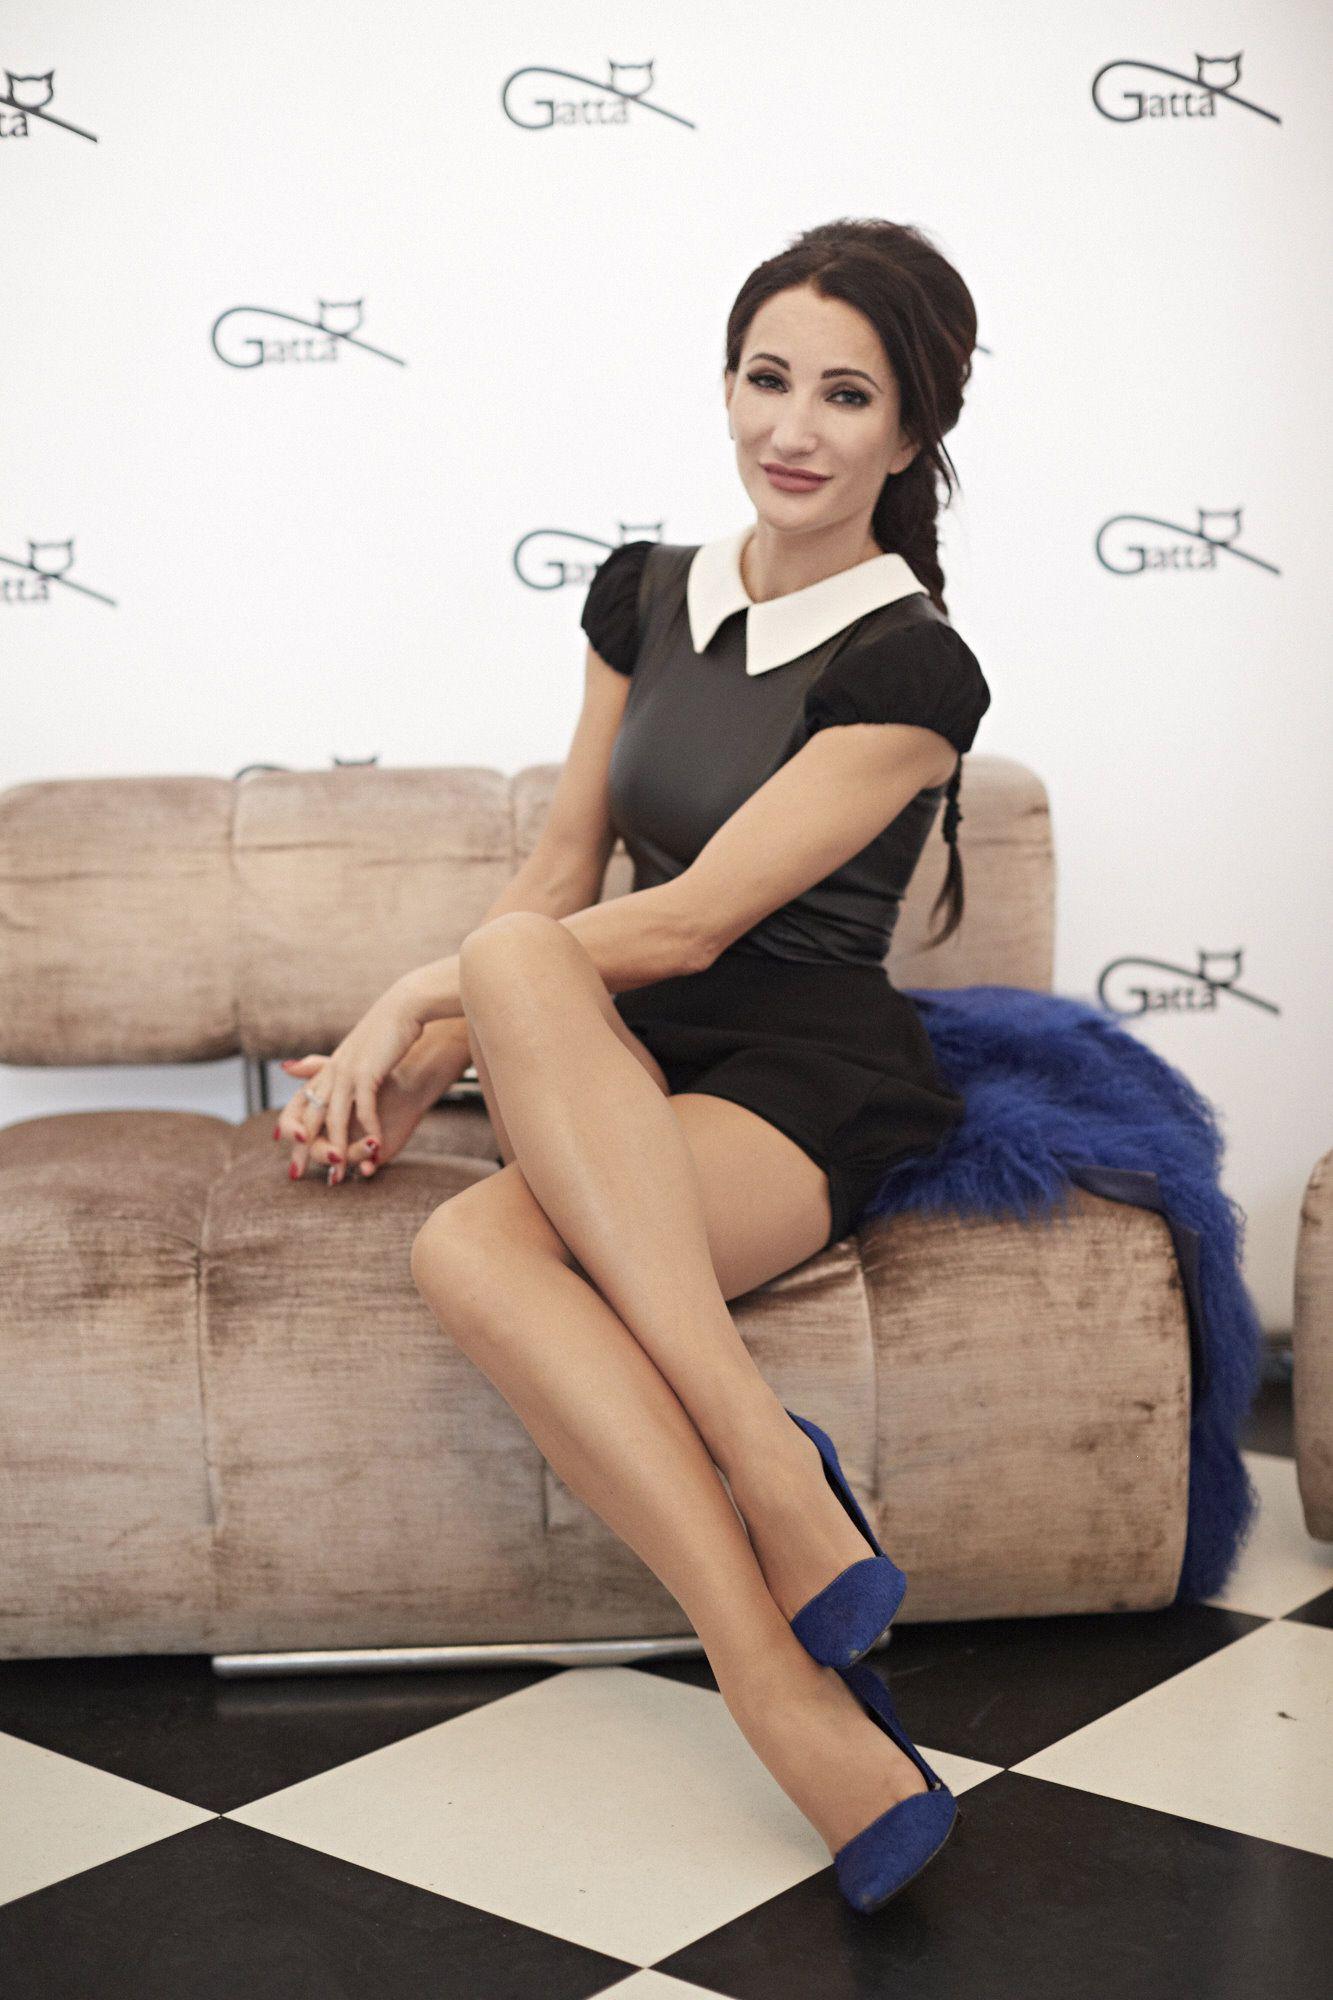 Pussy Celebrity Justyna Steczkowska naked photo 2017